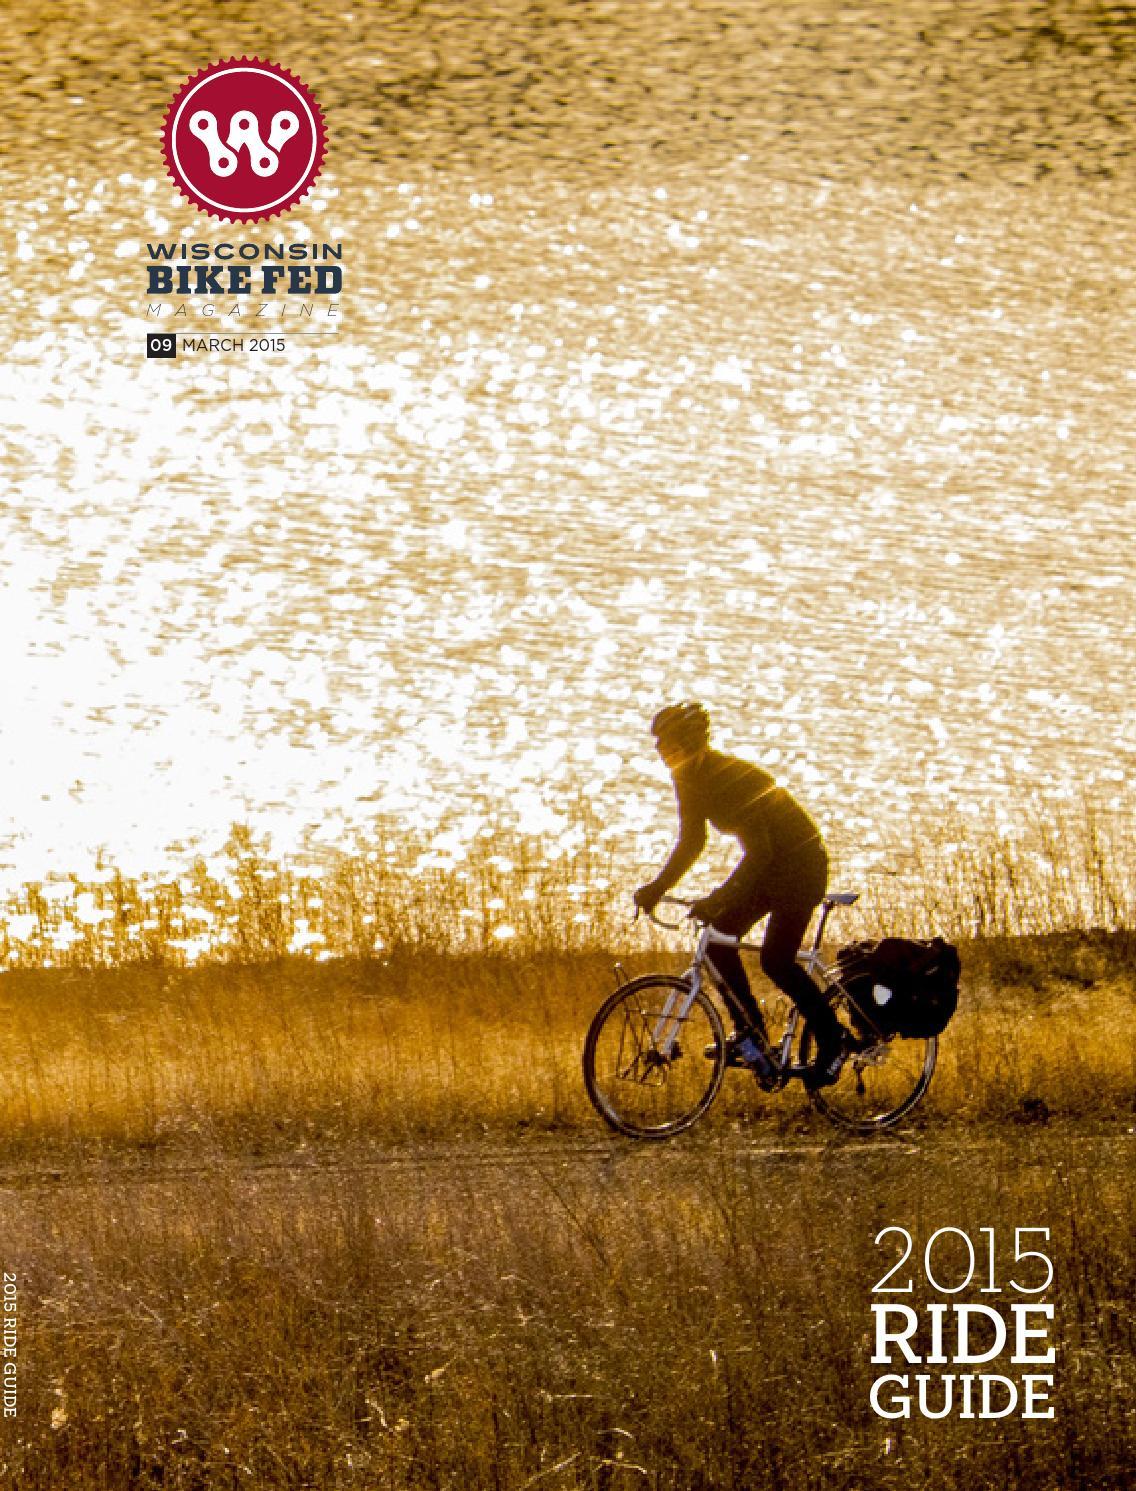 2372affd73f Wisconsin Bike Fed Magazine Ride Guide, March 2015 by Wisconsin Bike Fed -  issuu